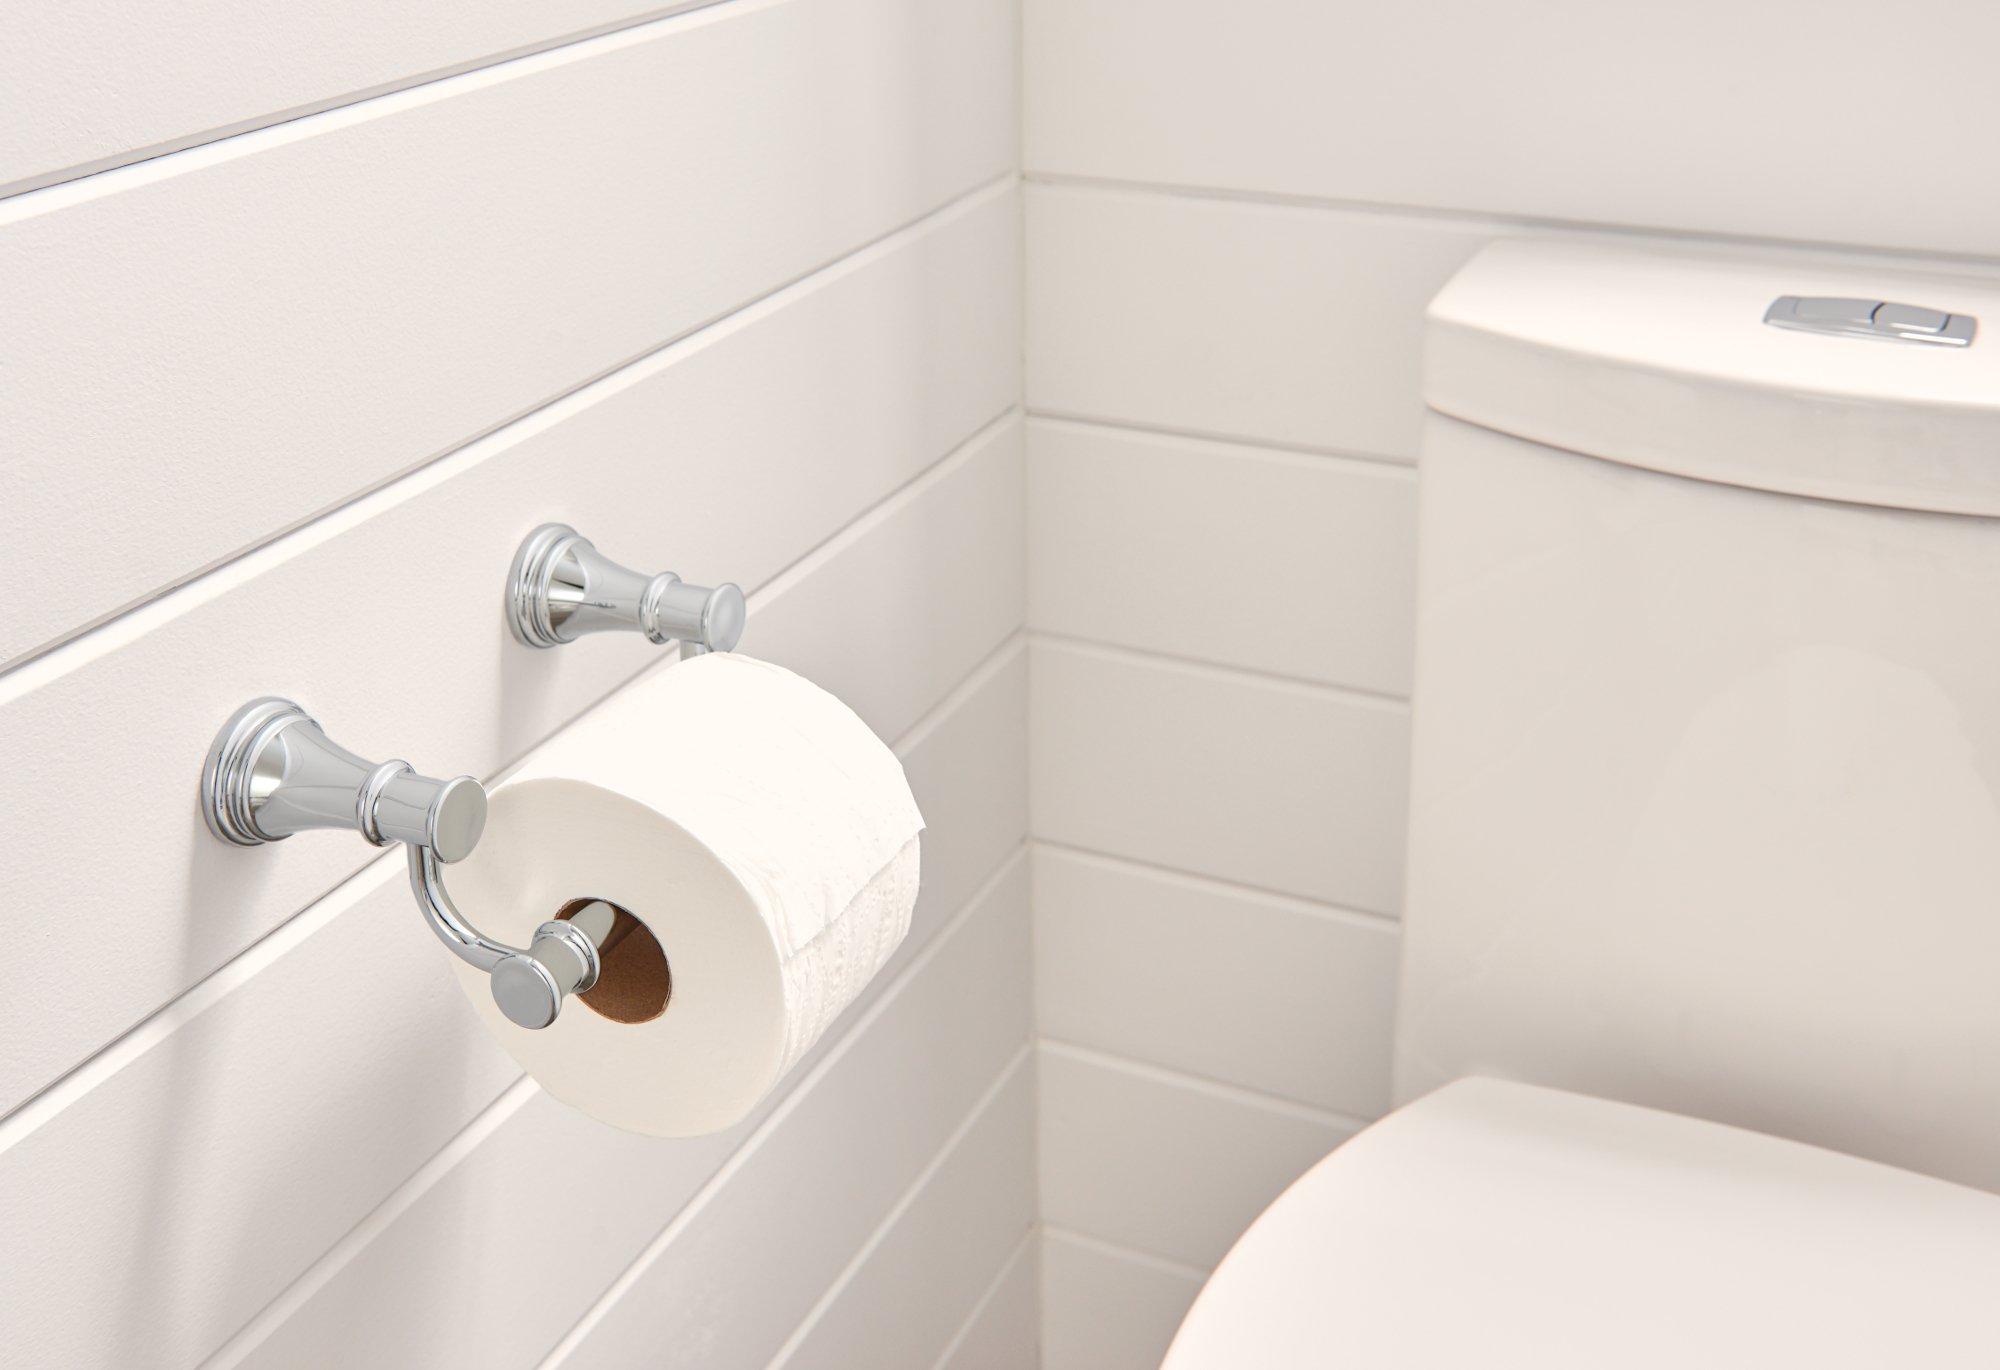 Moen YB6408CH Belfield Pivoting Toilet Paper Holder, Chrome by Moen (Image #2)